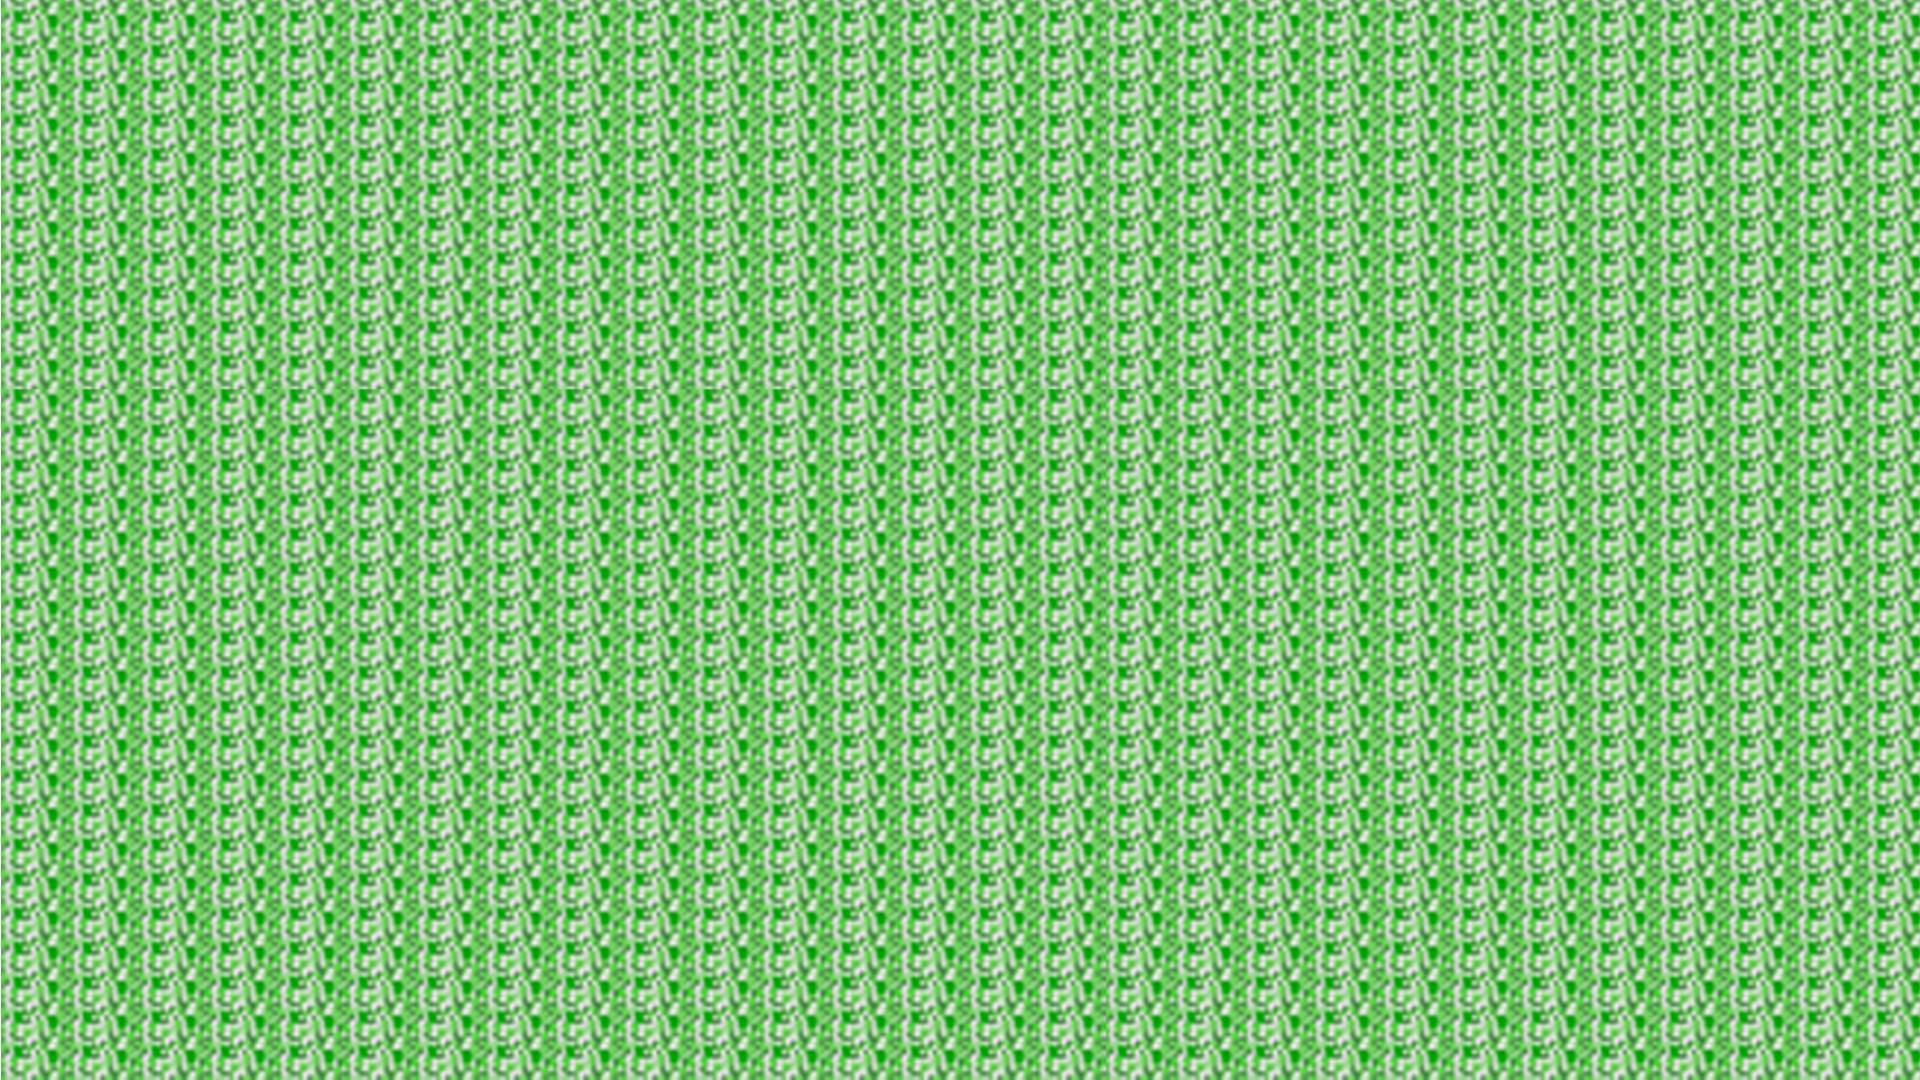 Creeper skin wallpaper by frostyvamp on DeviantArt